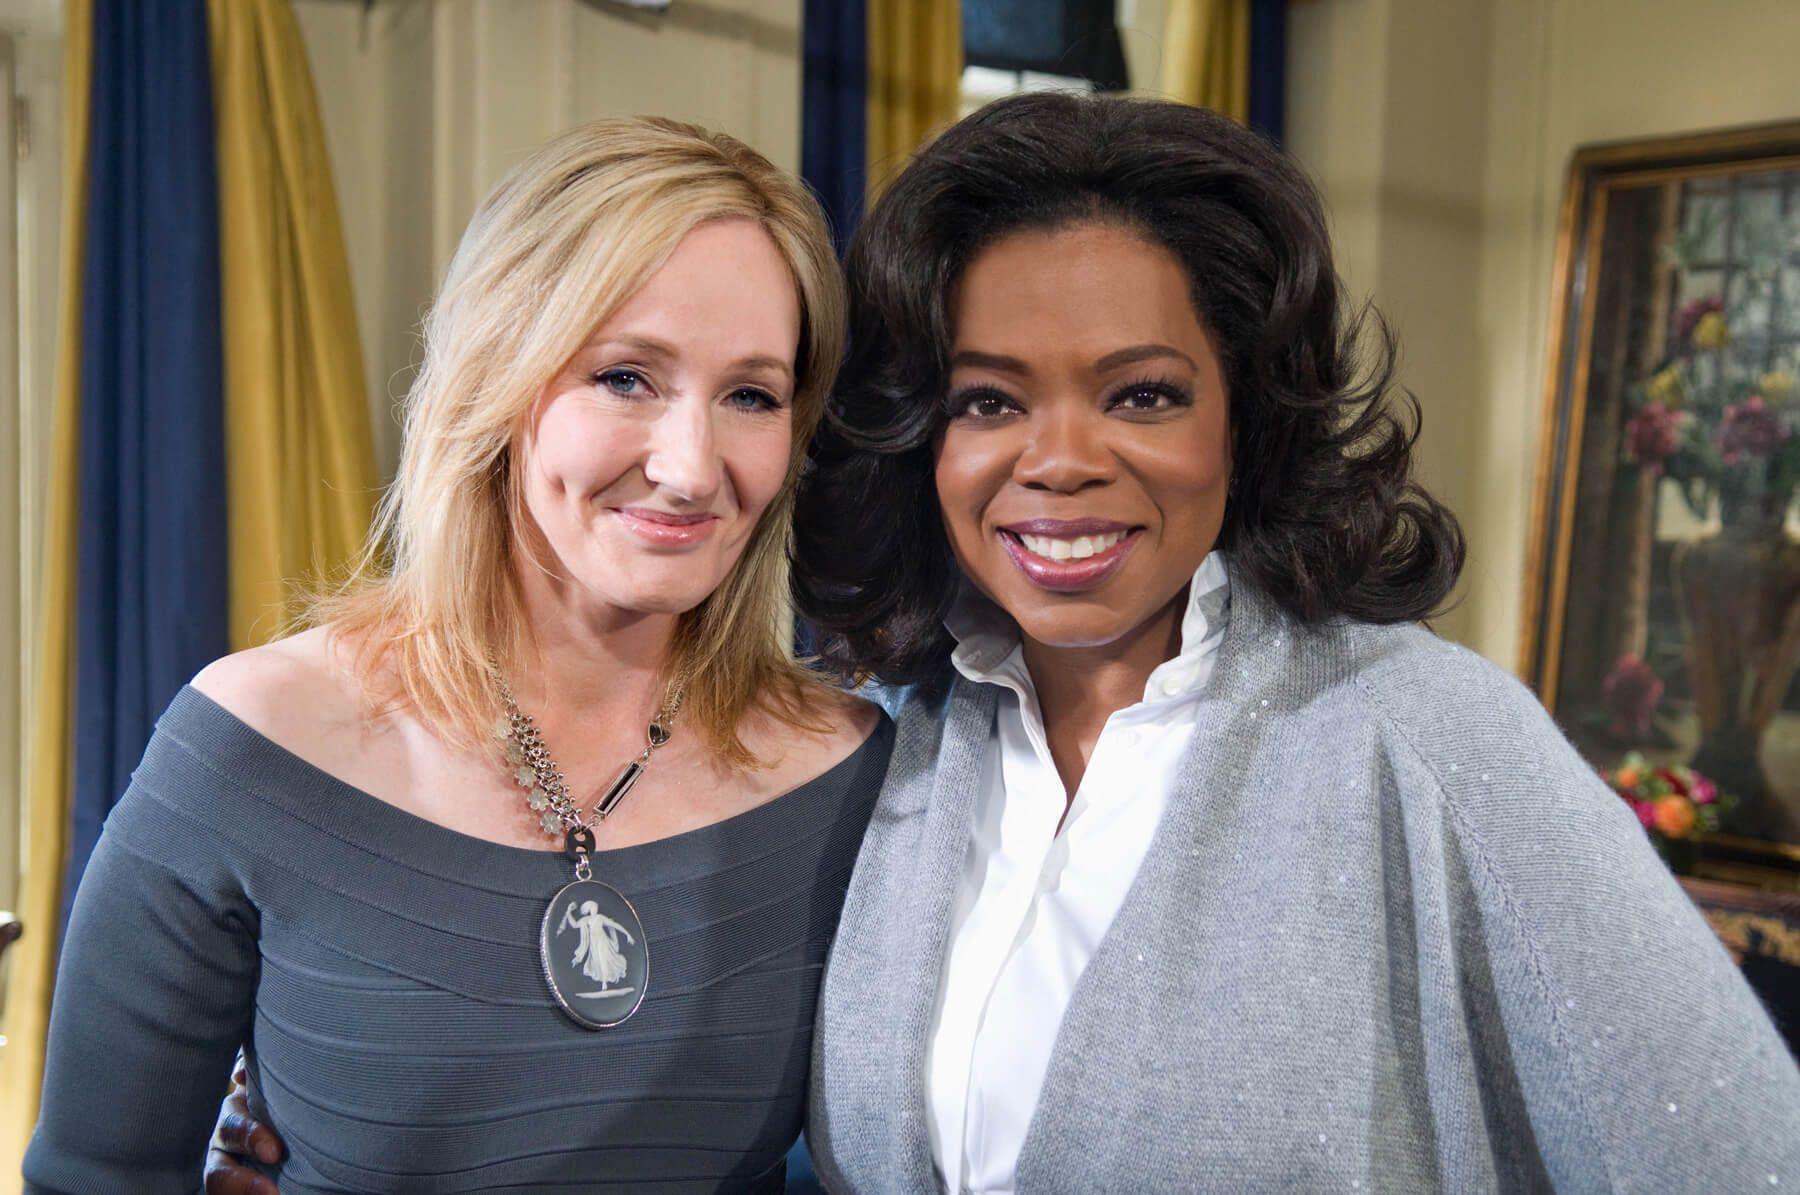 Джоан Роулинг и Опра Уинфри / oprah.com